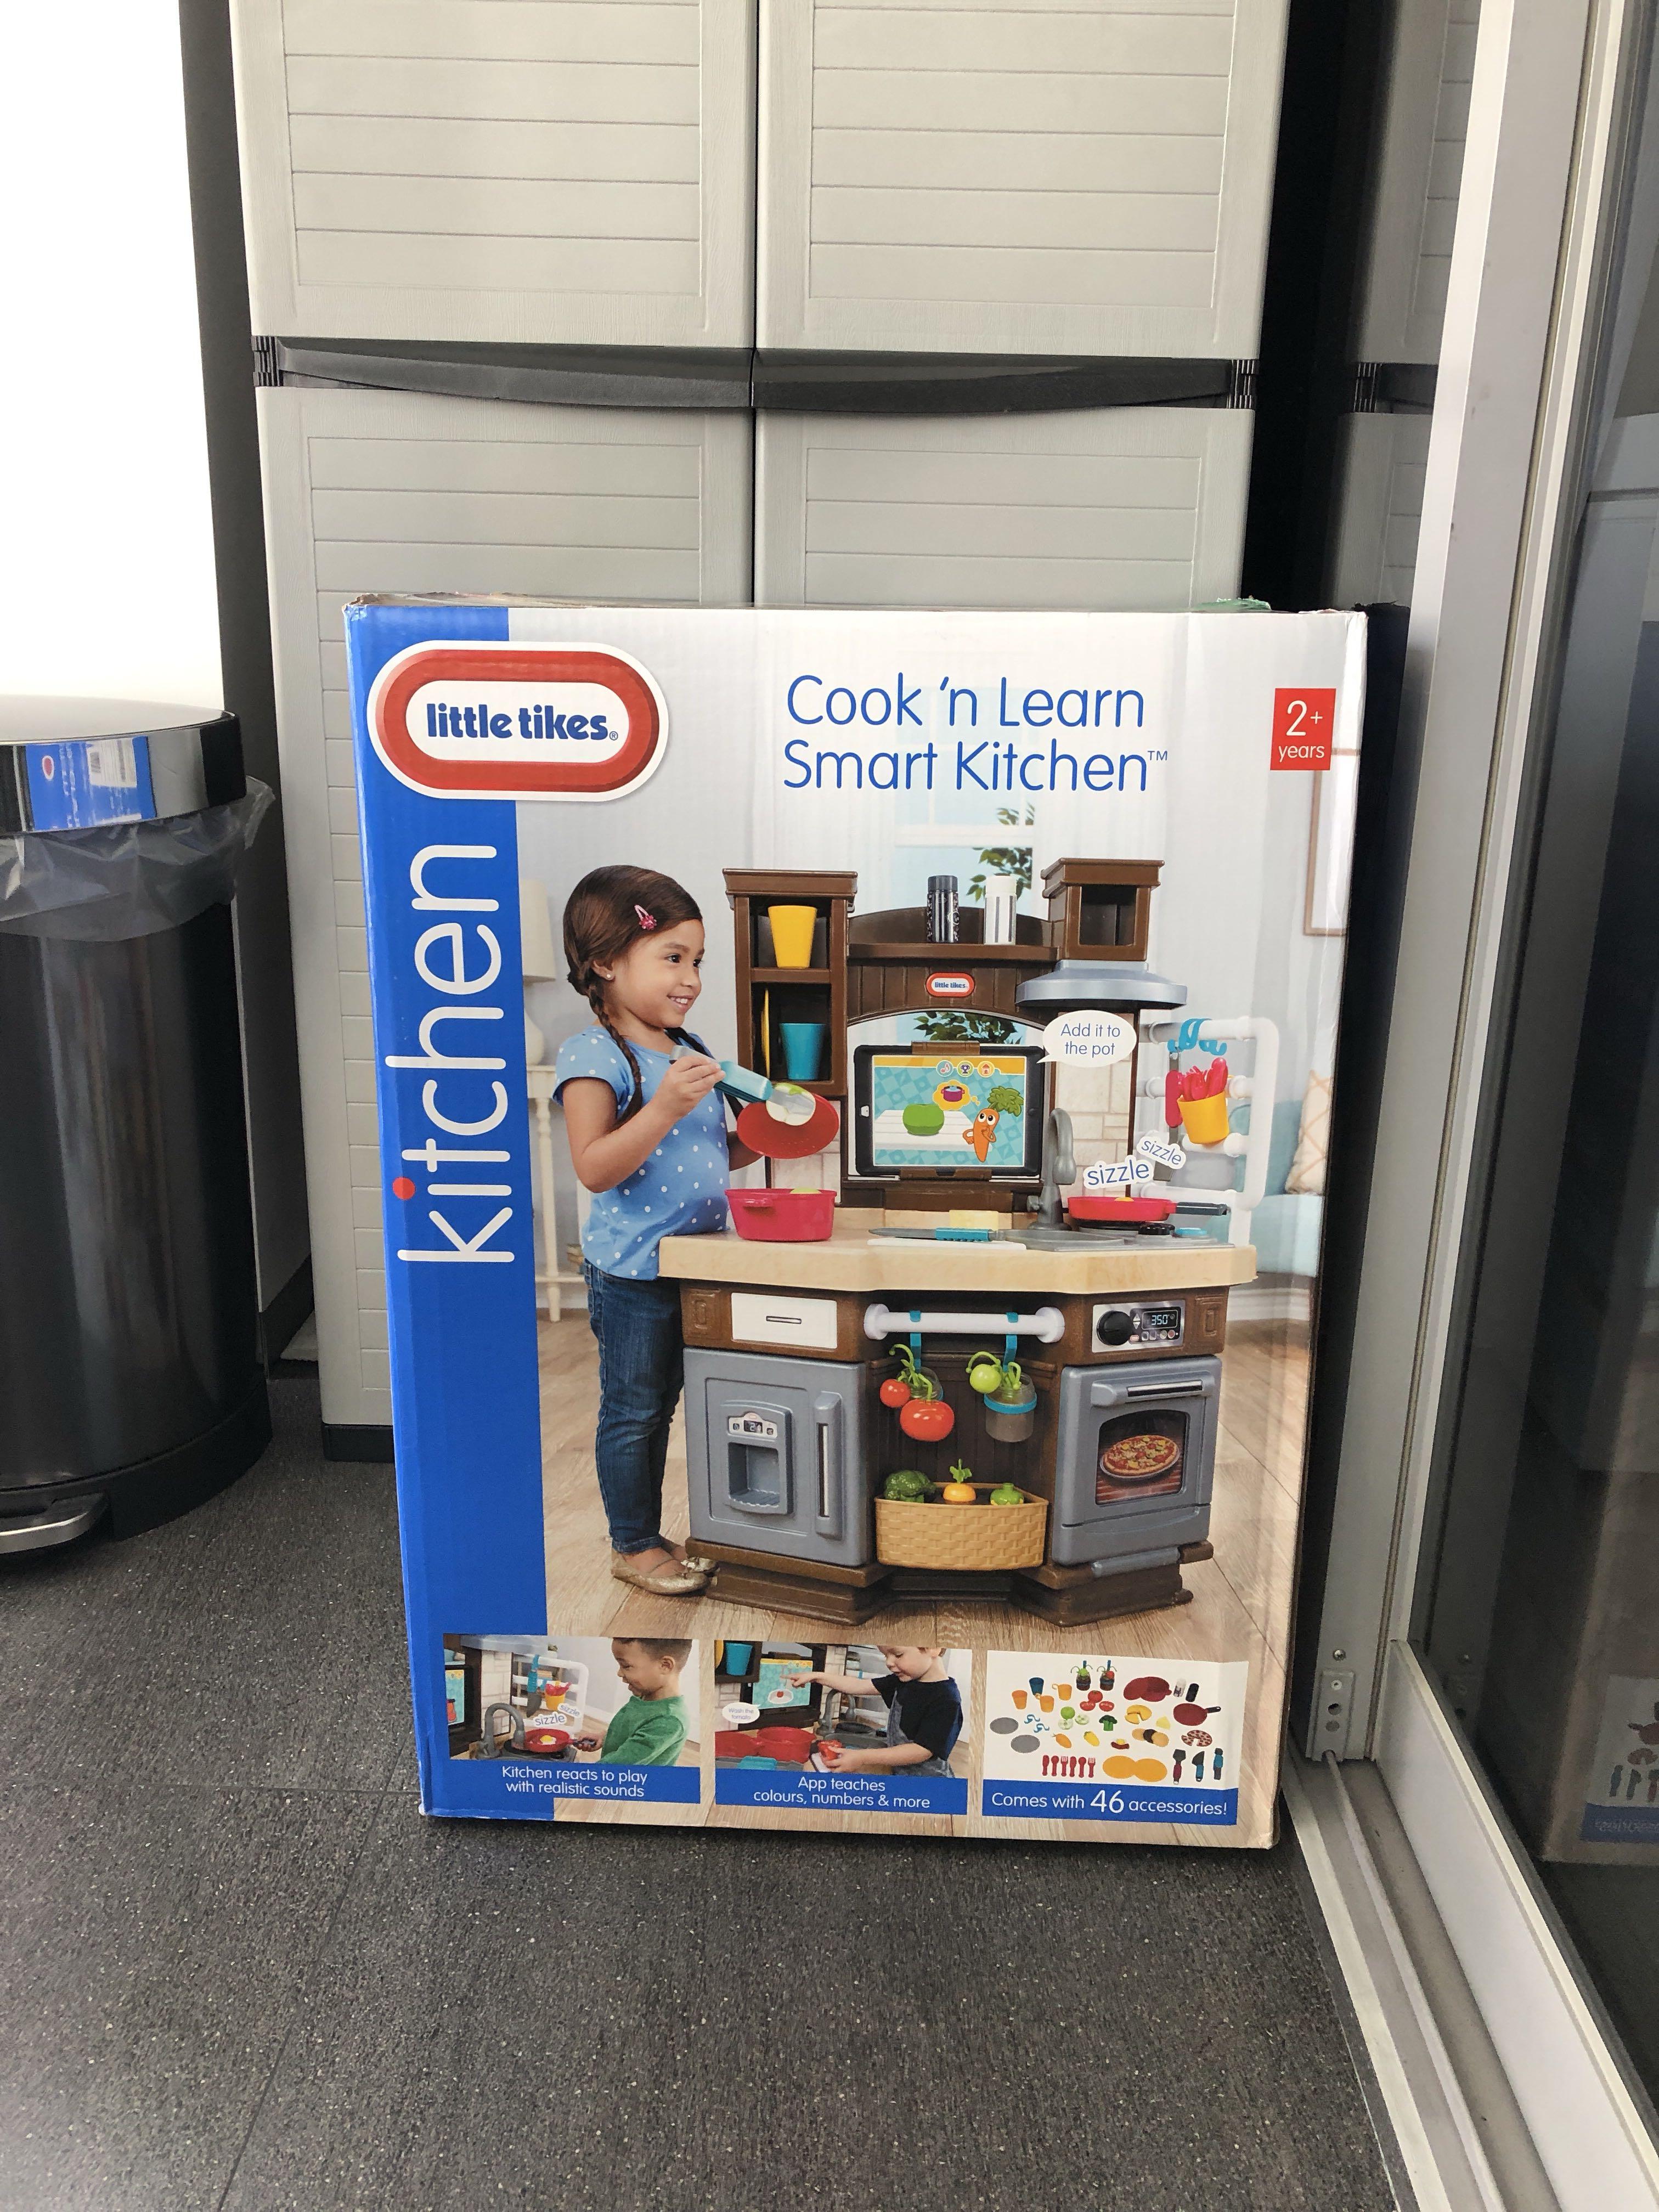 Little Tikes Cook N Learn Smart Kitchen